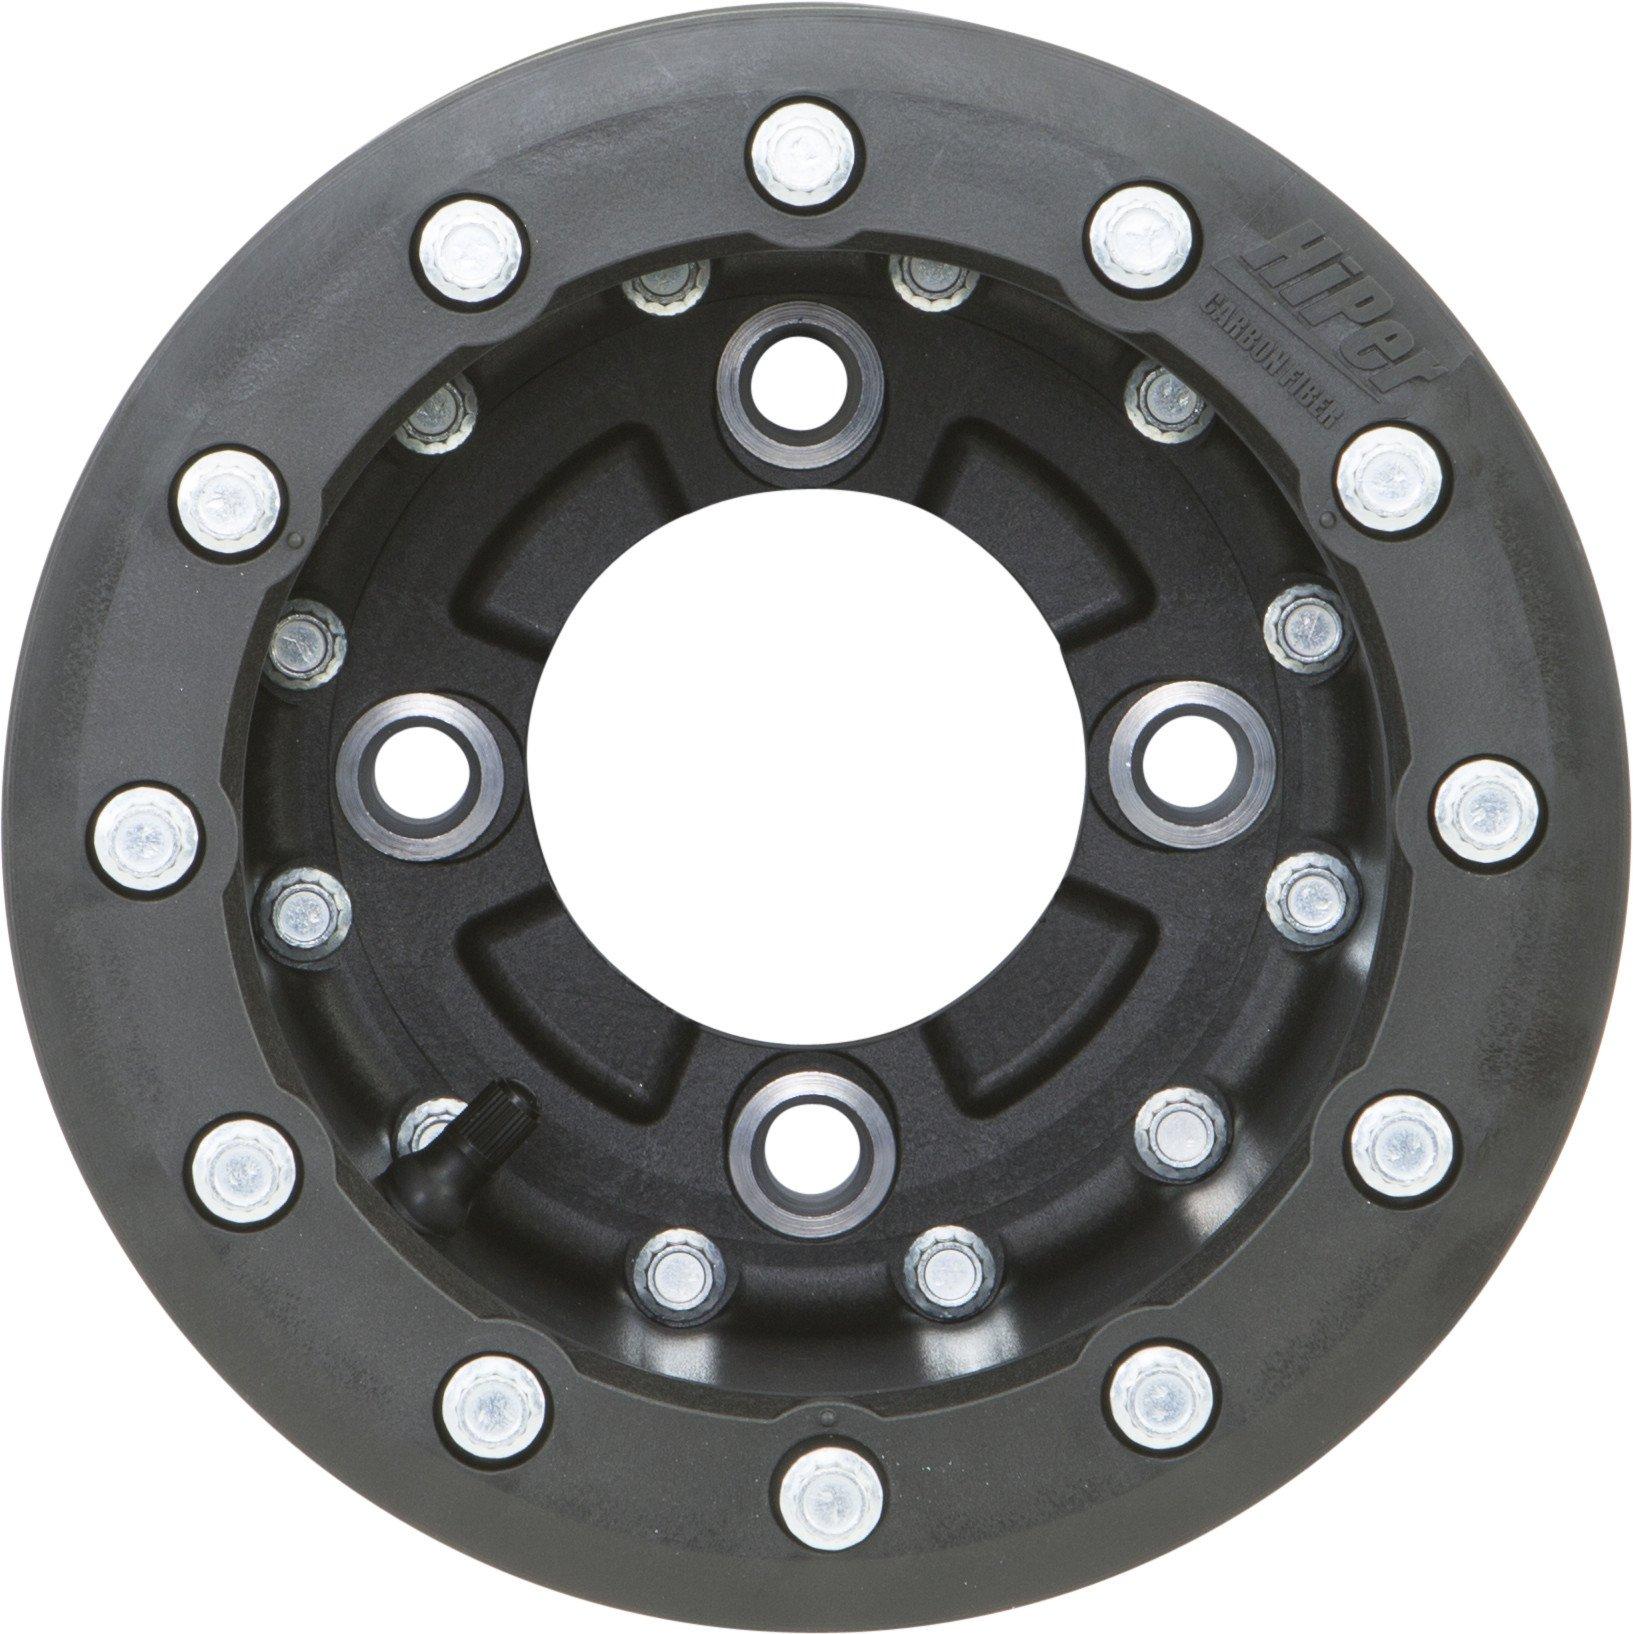 Hiper Wheel 9X8 RR SNGLBDLCK CF1 3+5 4/115 Rim & Spoke Kits CF1 Wheels BLK9X8 3+5 4/115 YAMAHA - 0980-YAR-C-SBL-BK